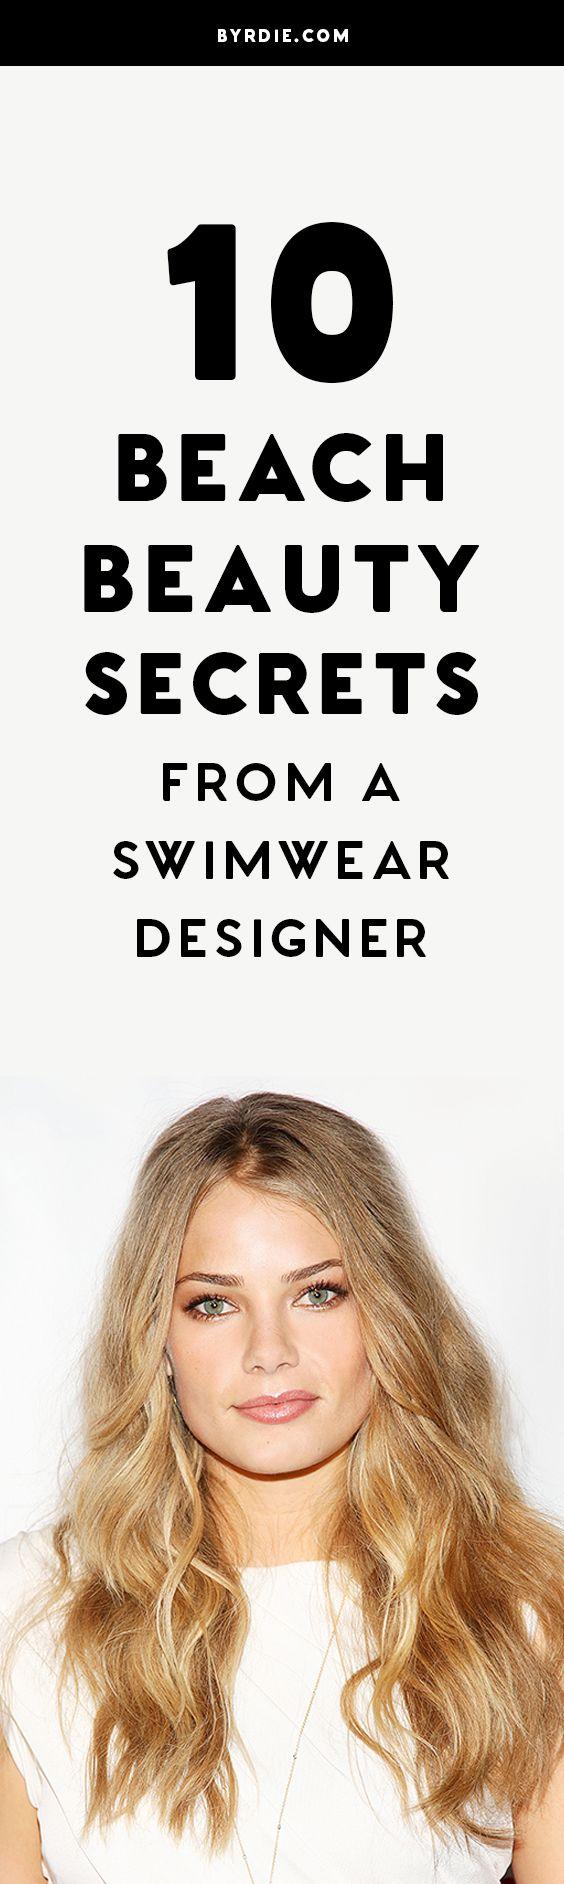 Tori Praver's beach beauty secrets